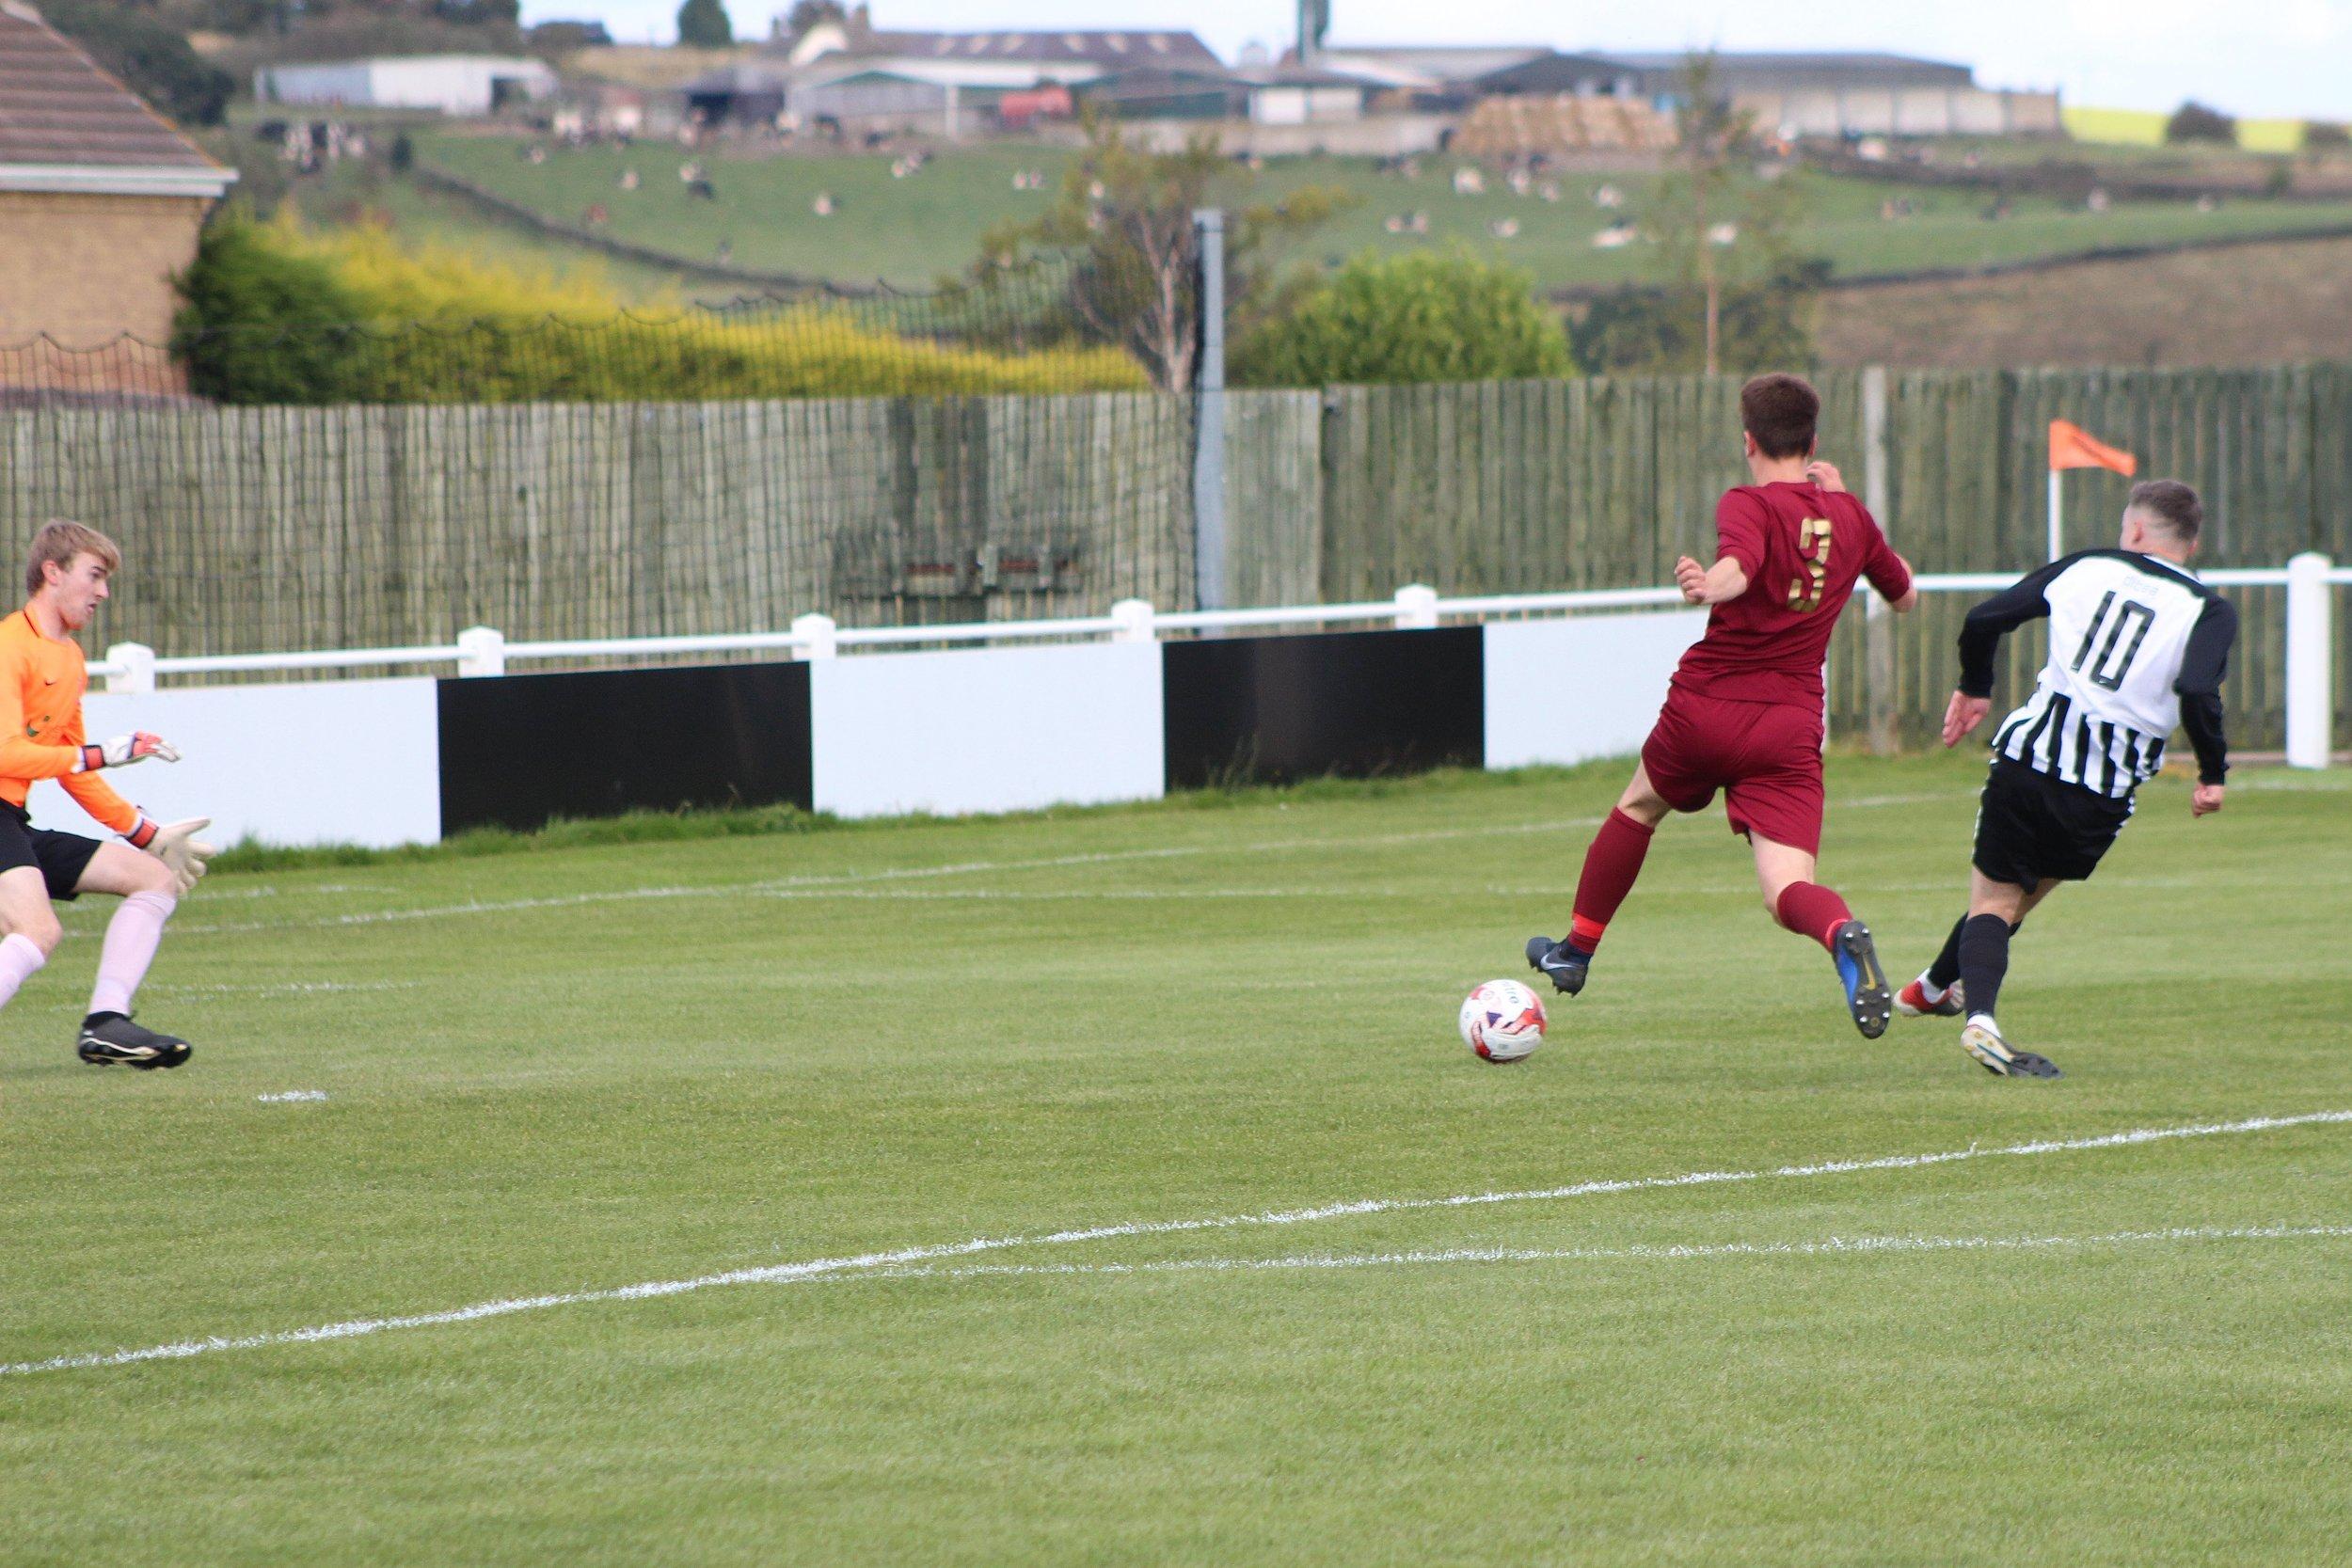 Jordan Codhuri puts Church 1-0 up